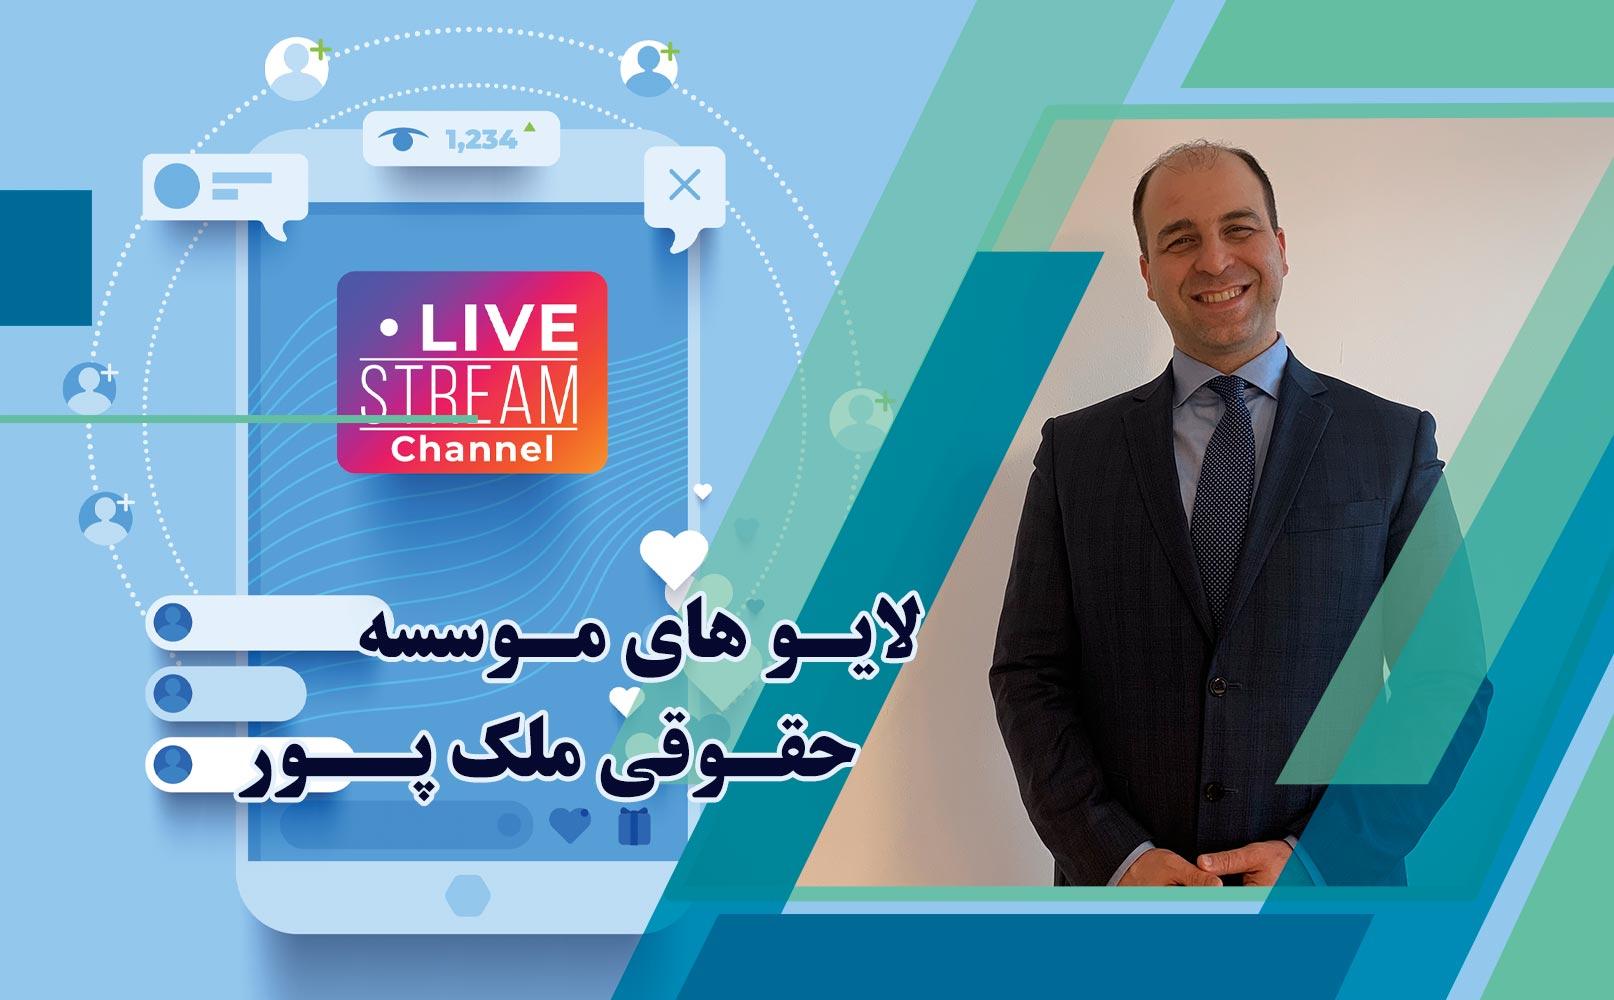 لایوهای موسسه حقوقی ملک پور